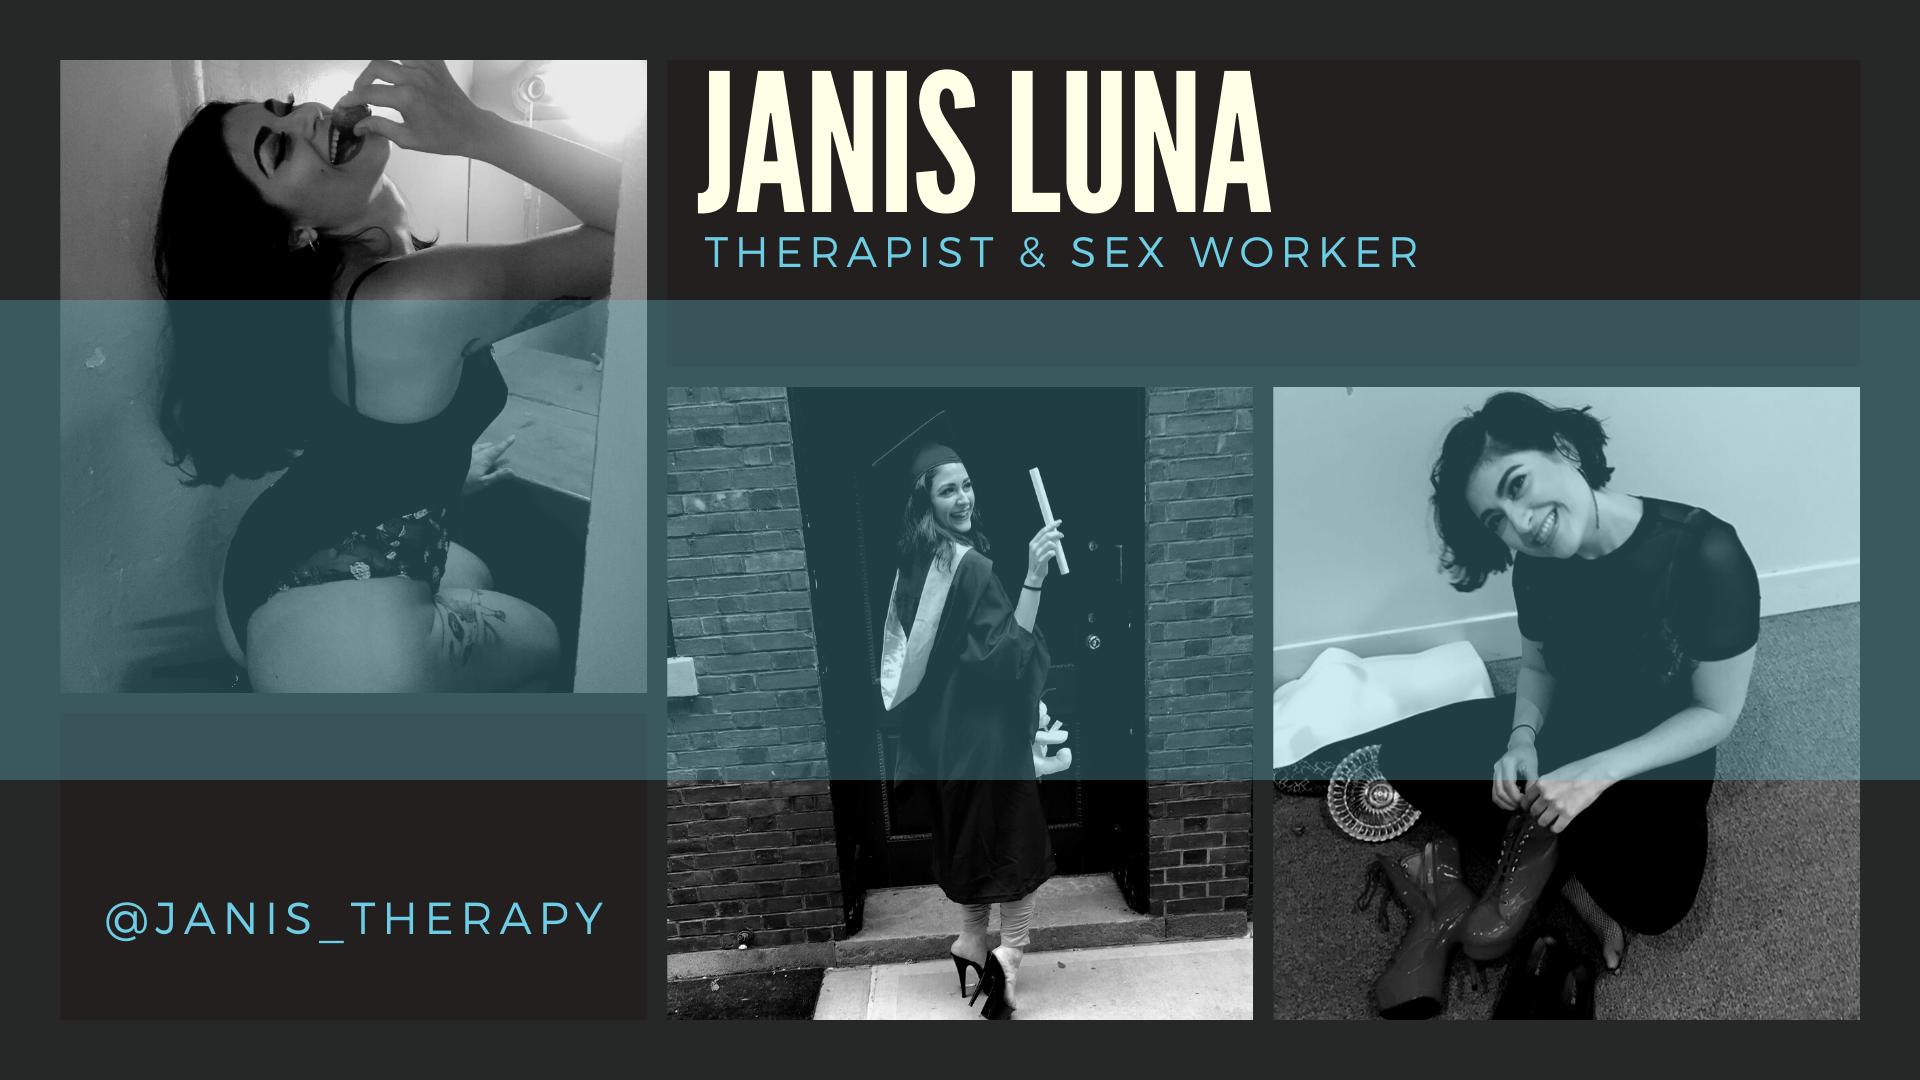 Janis Luna